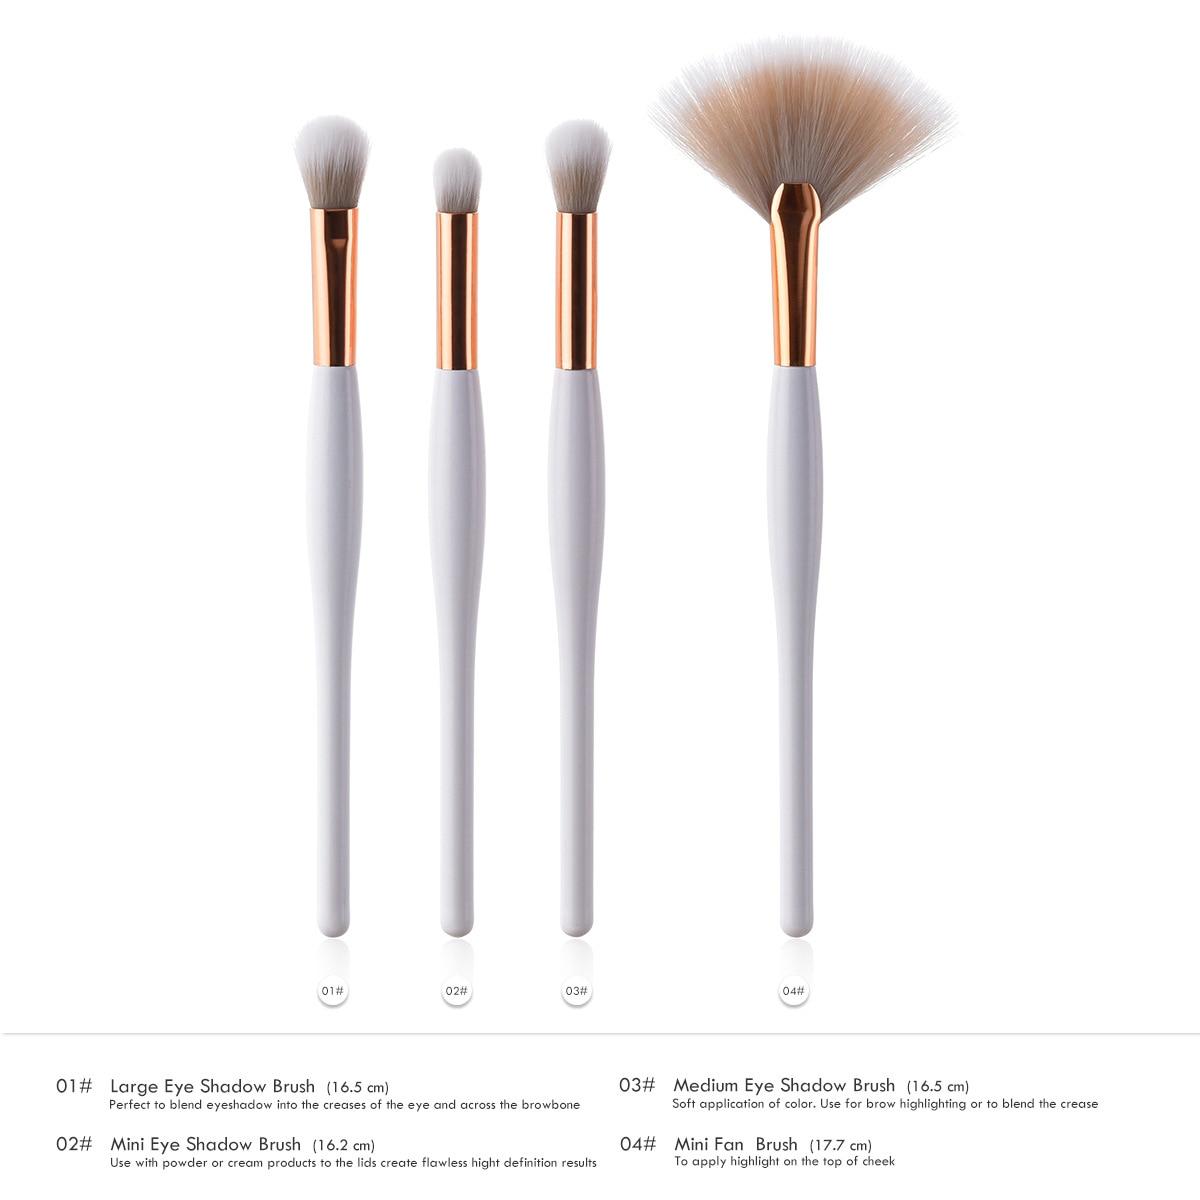 Tesoura de Maquiagem cintura pincéis de maquiagem ferramenta Use For : bb Cream, power, foundation, blusher